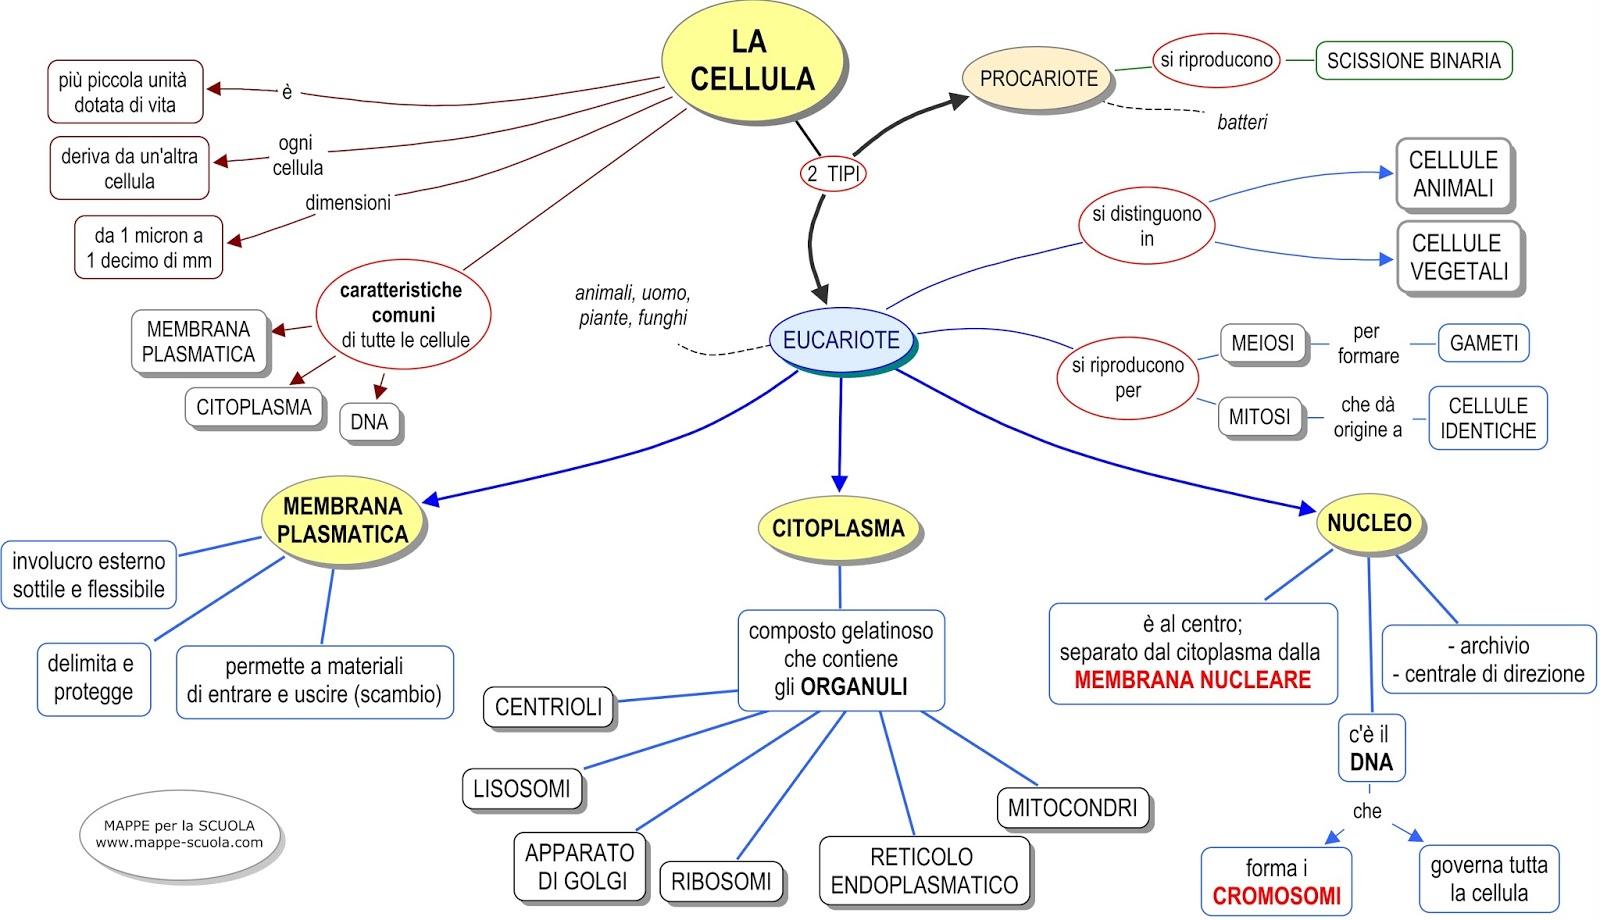 Célèbre MAPPE per la SCUOLA: LA CELLULA, EUCARIOTA e PROCARIOTA NL51